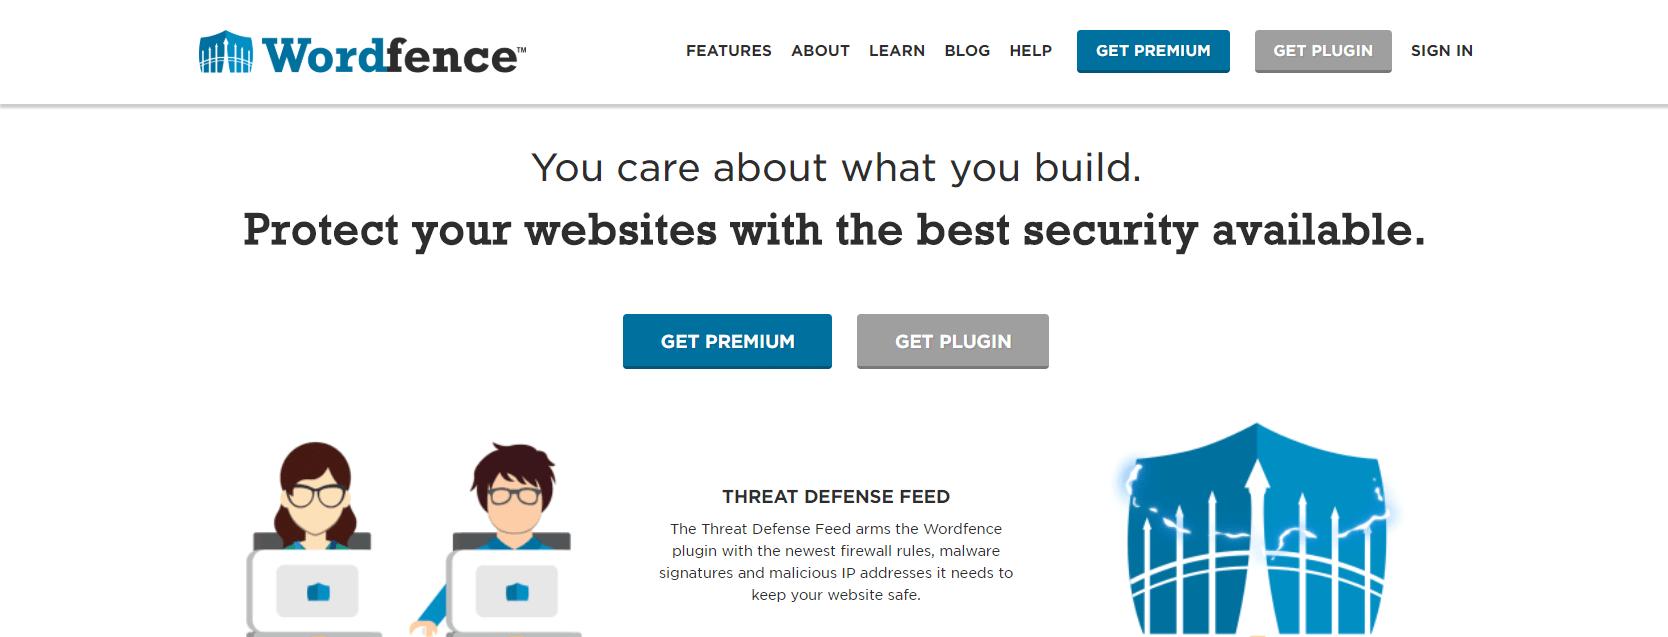 The Wordfence plugin.